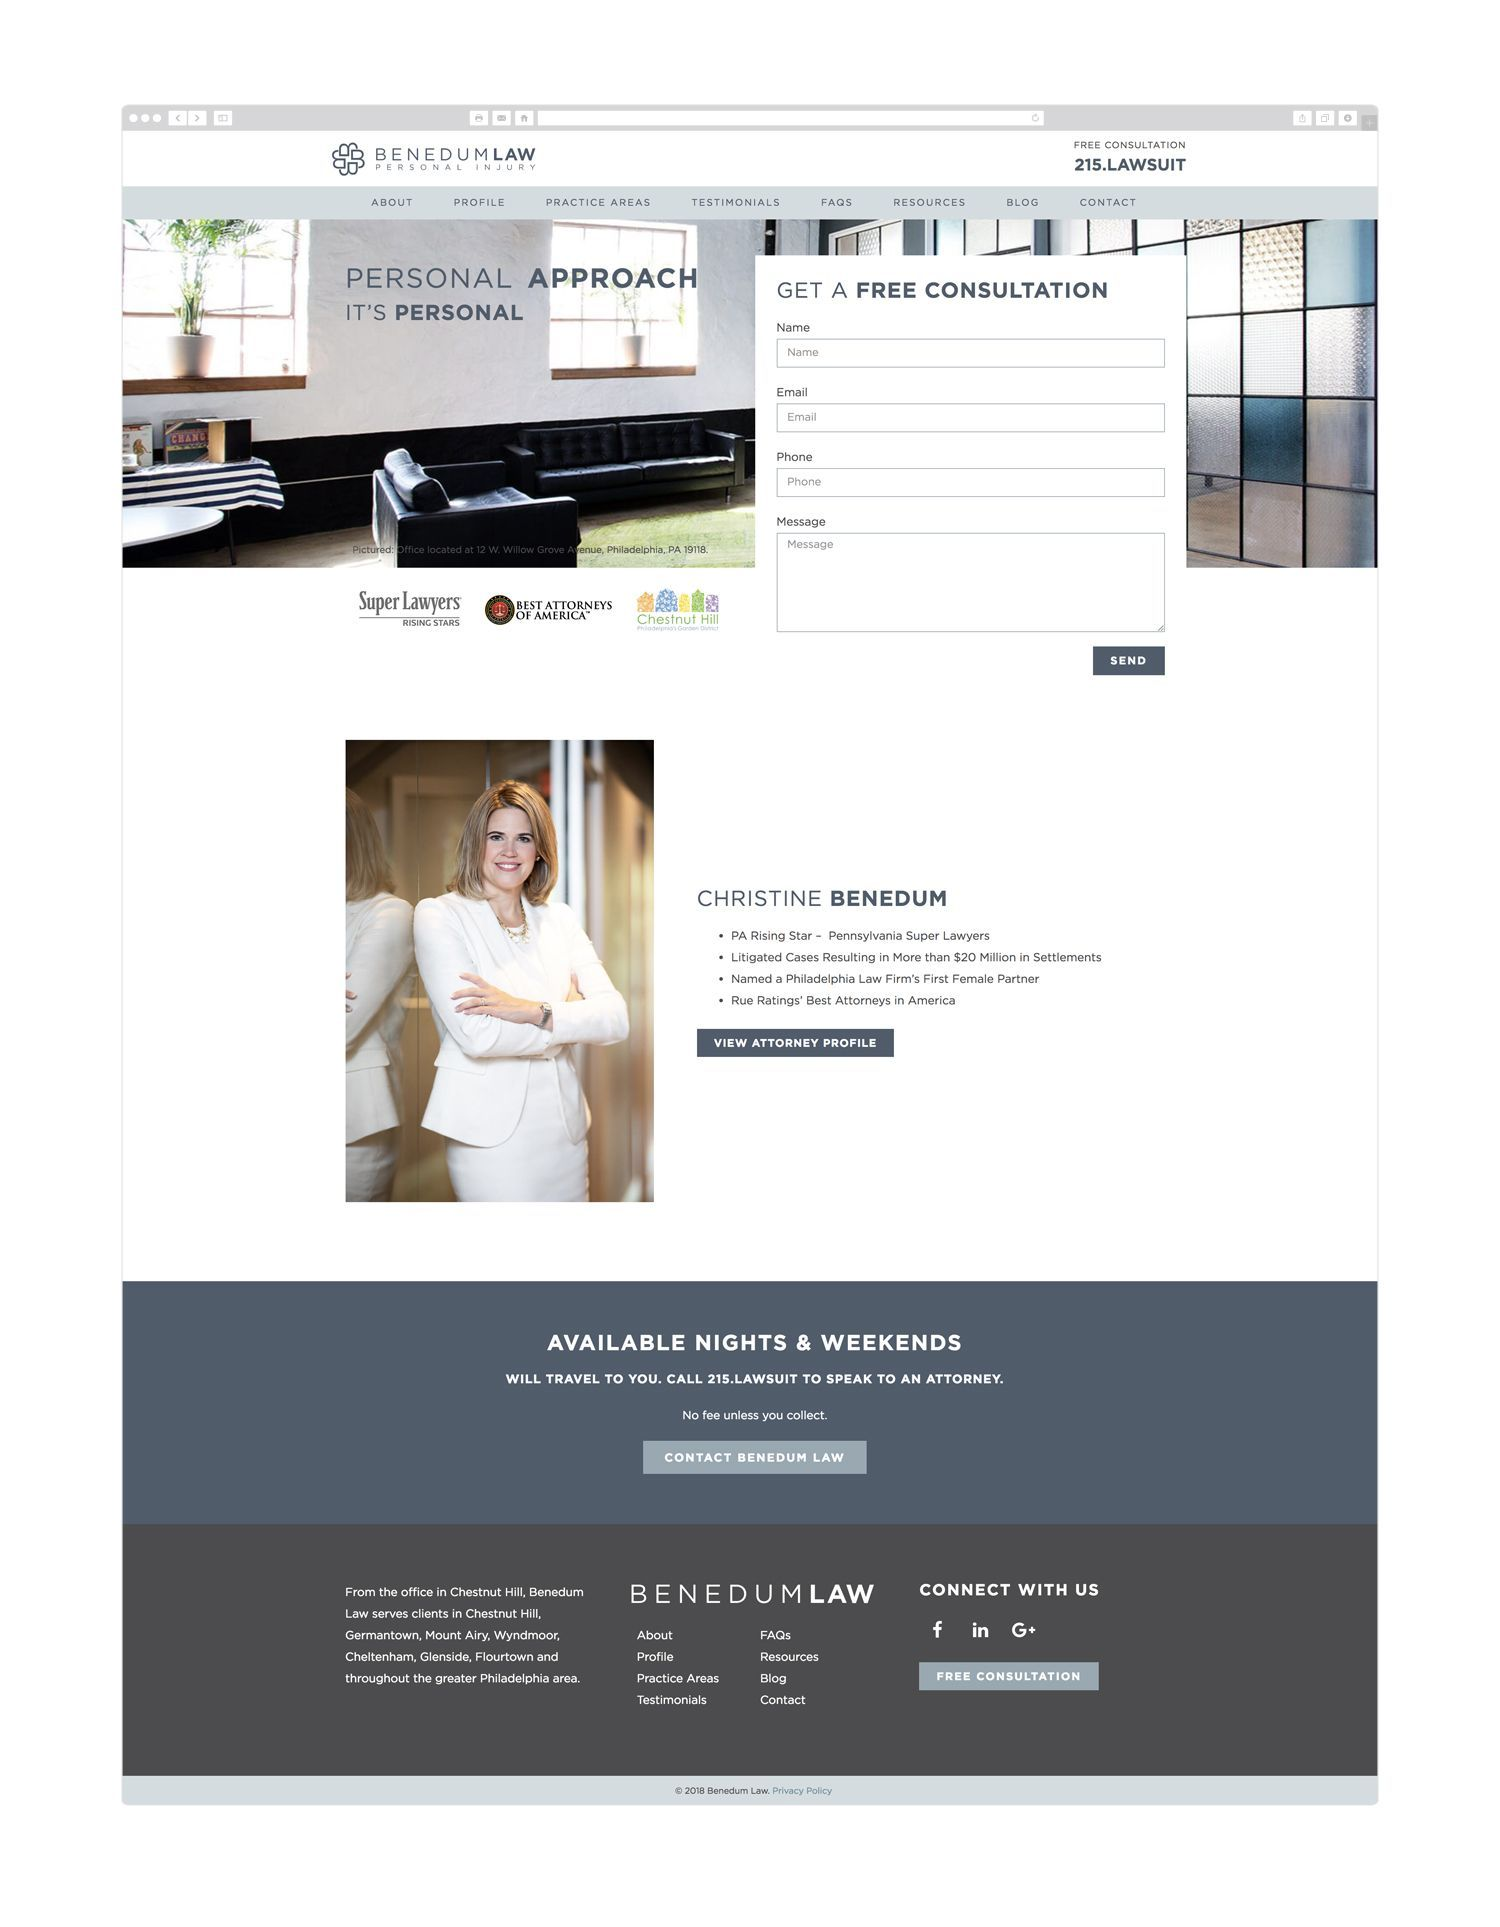 Philadelphia Law Firm Website Design Wicky Design Law Firm Website Design Law Firm Website Design